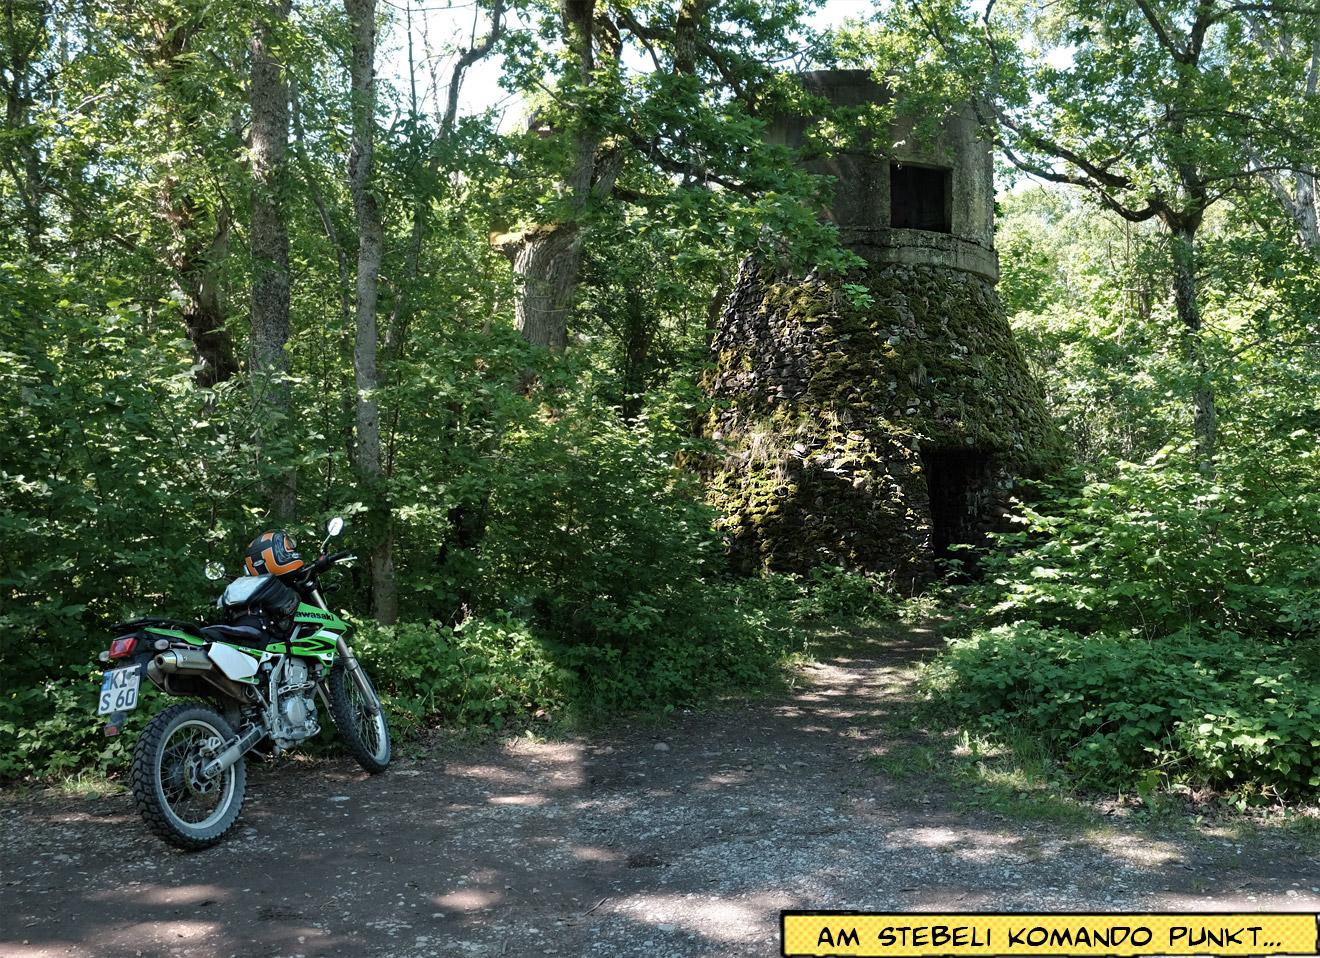 Bunker Stebeli Komando Punkt